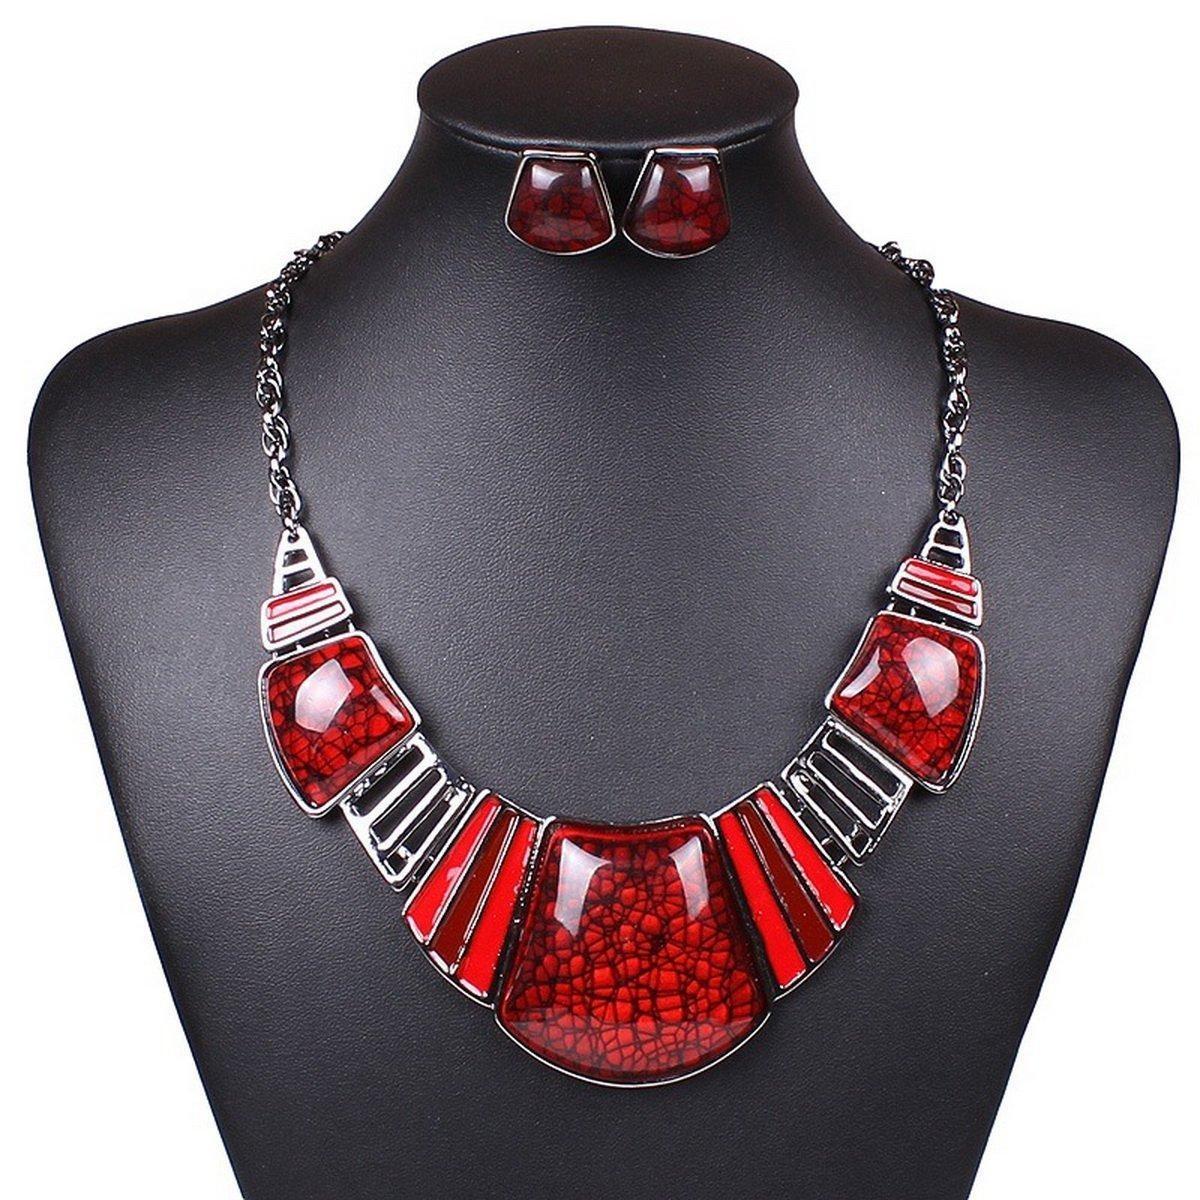 ARICO Moon Red Jewelry Sets Purple Enamel Jewelry Jewelry Set Resin Geometric Square Statement Necklace Set Earrings NB159